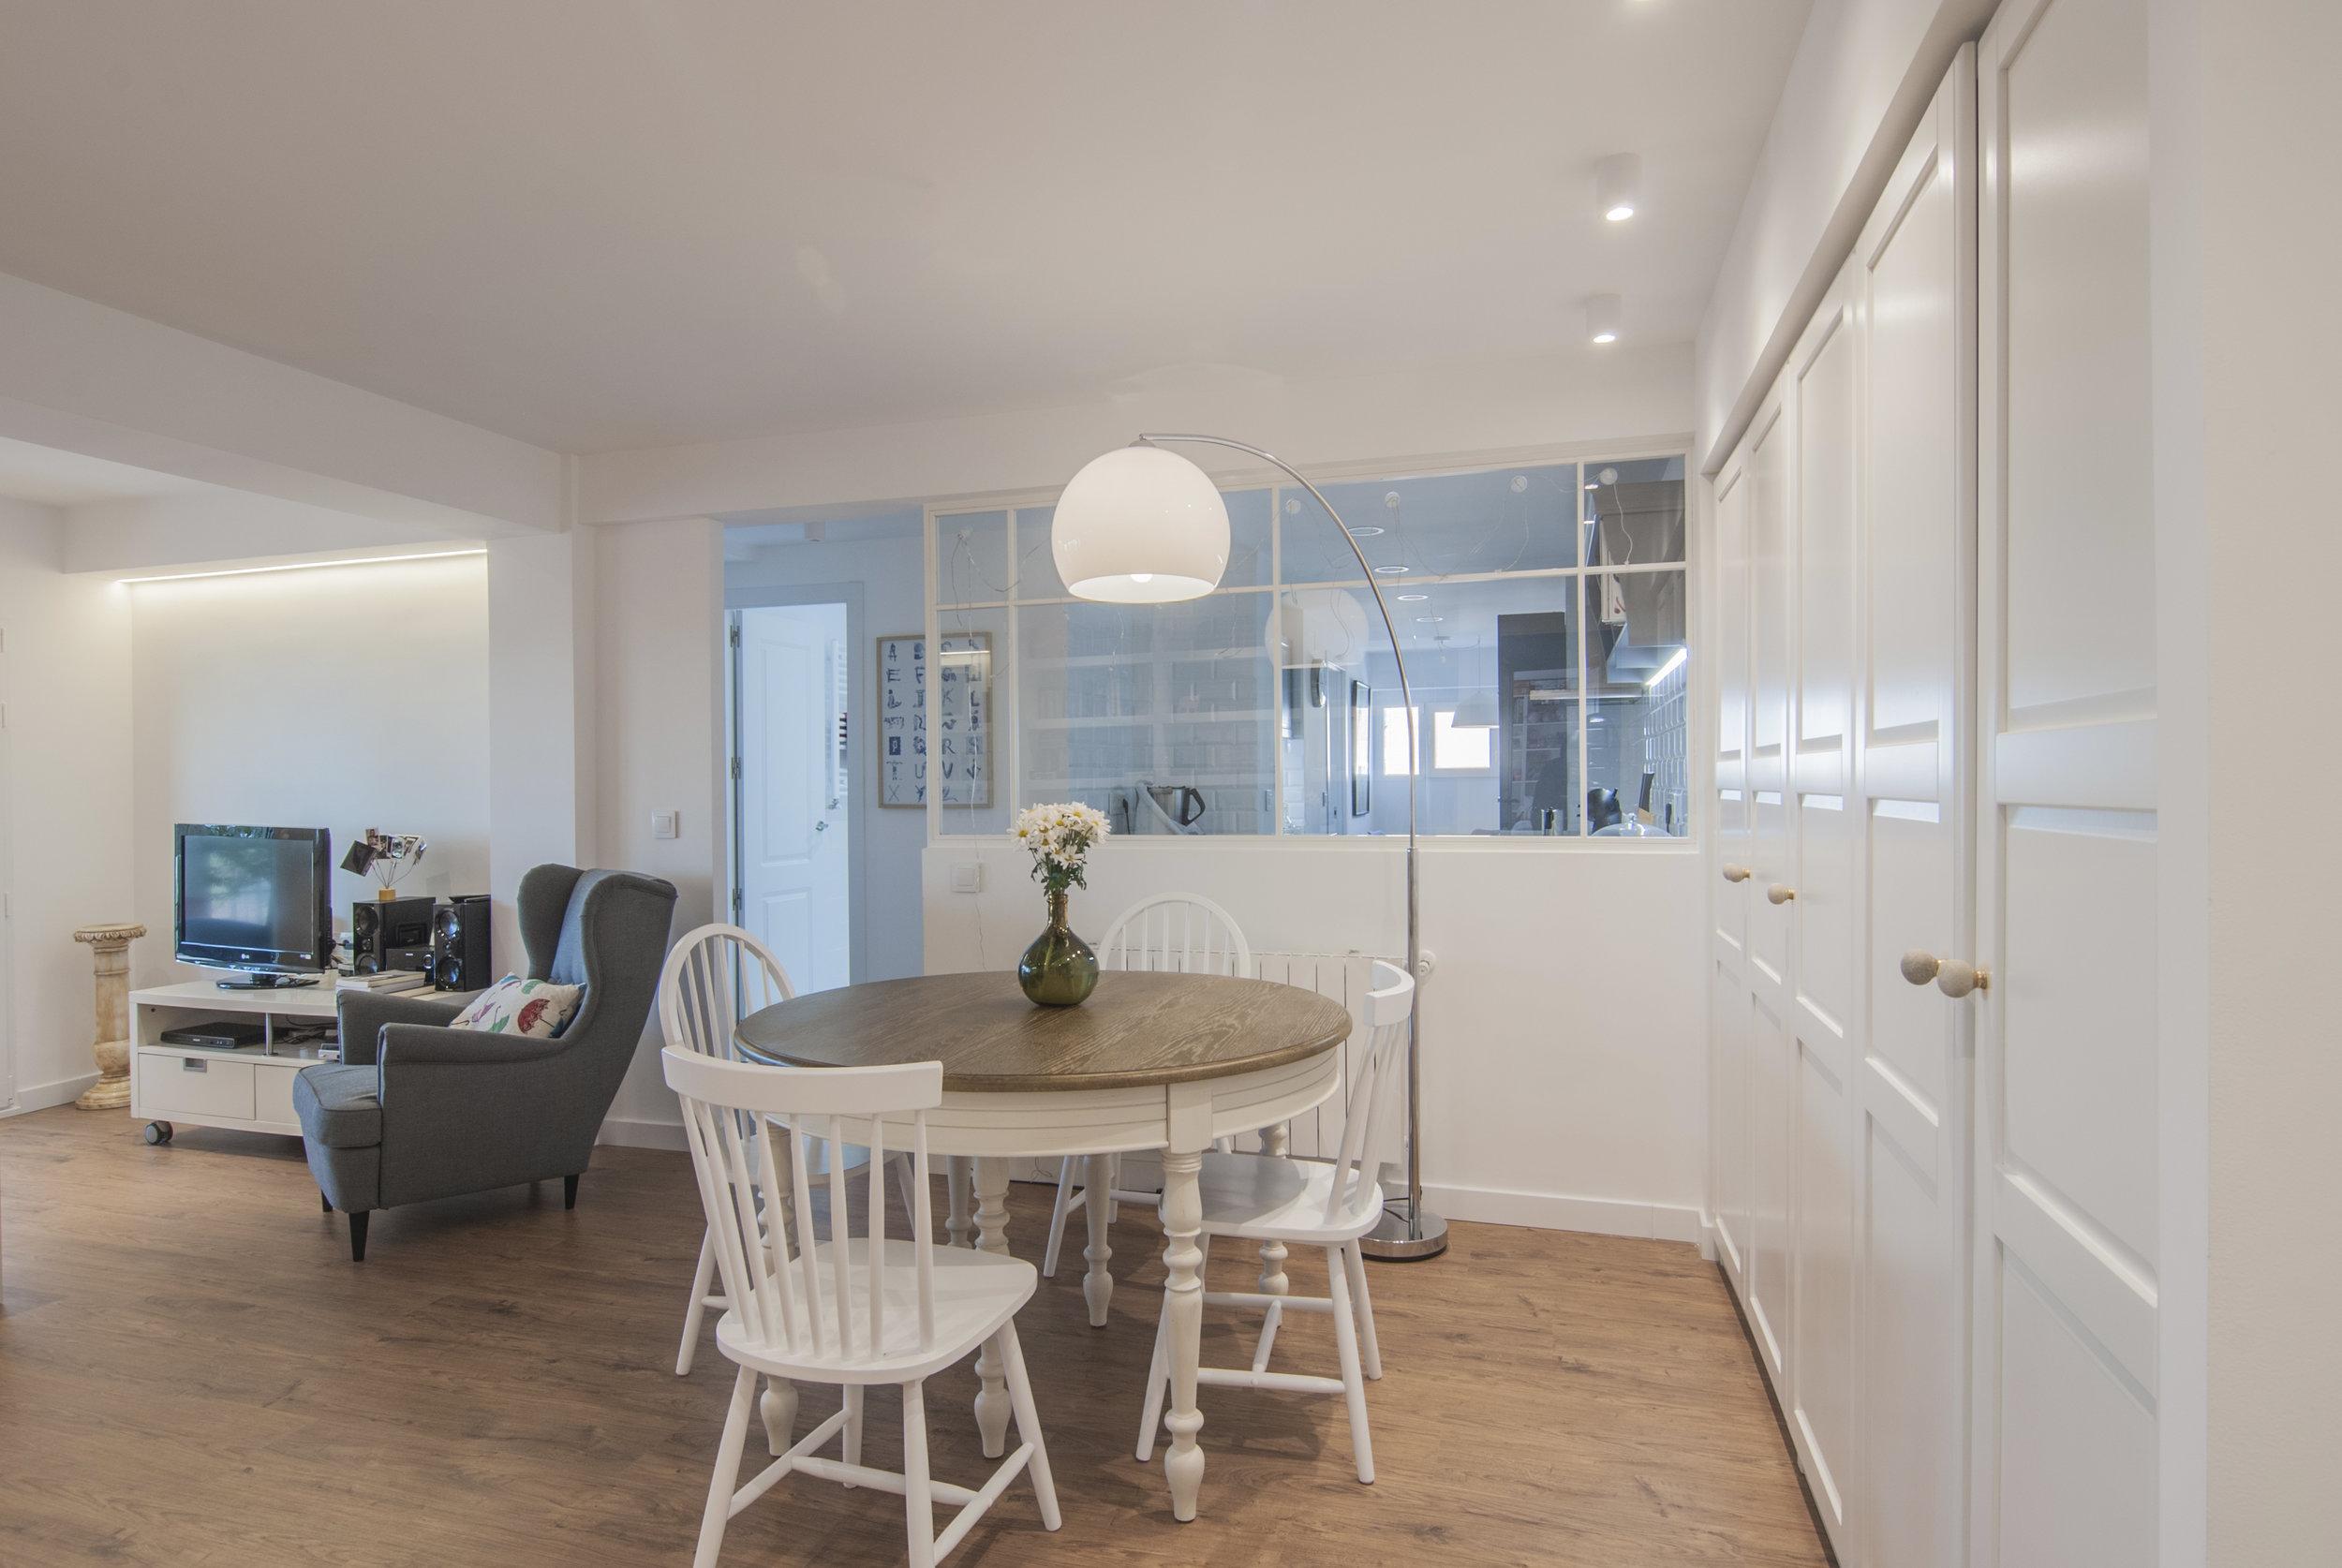 emmme studio slow design interiorismo integral comedor cocina salon hogar Debora.jpg